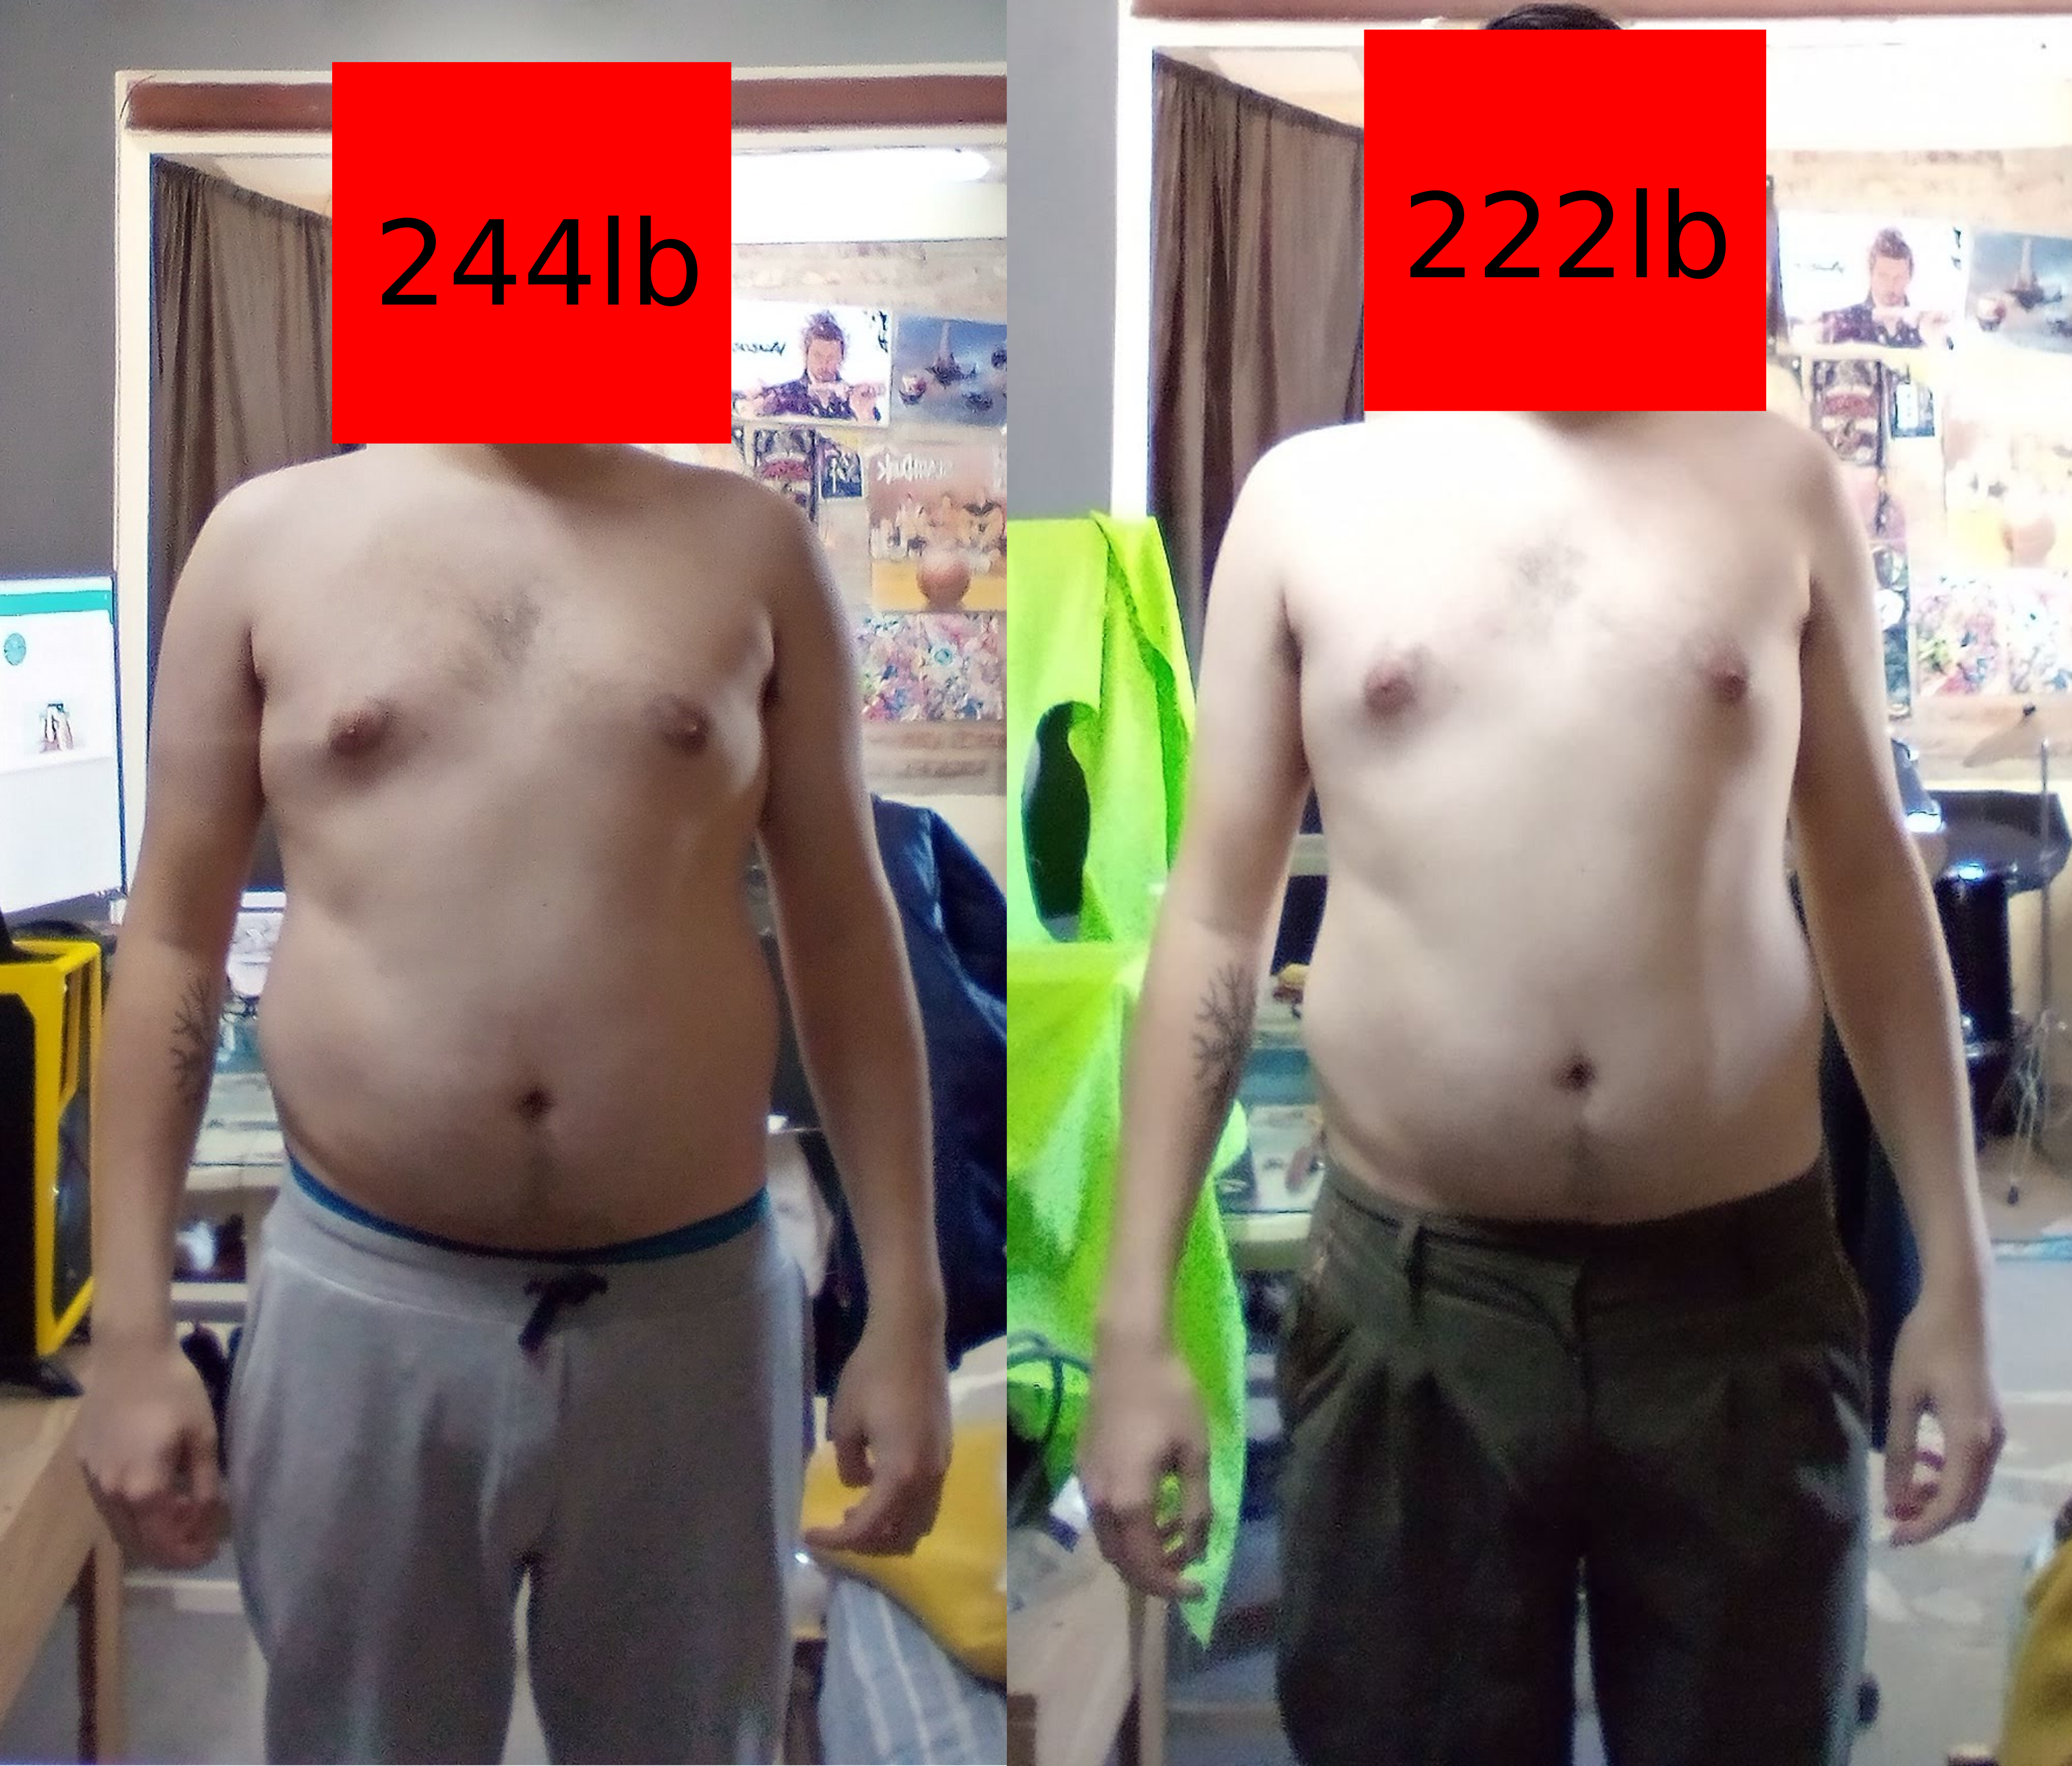 Progress Pics of 22 lbs Weight Loss 6 foot 2 Male 244 lbs to 222 lbs